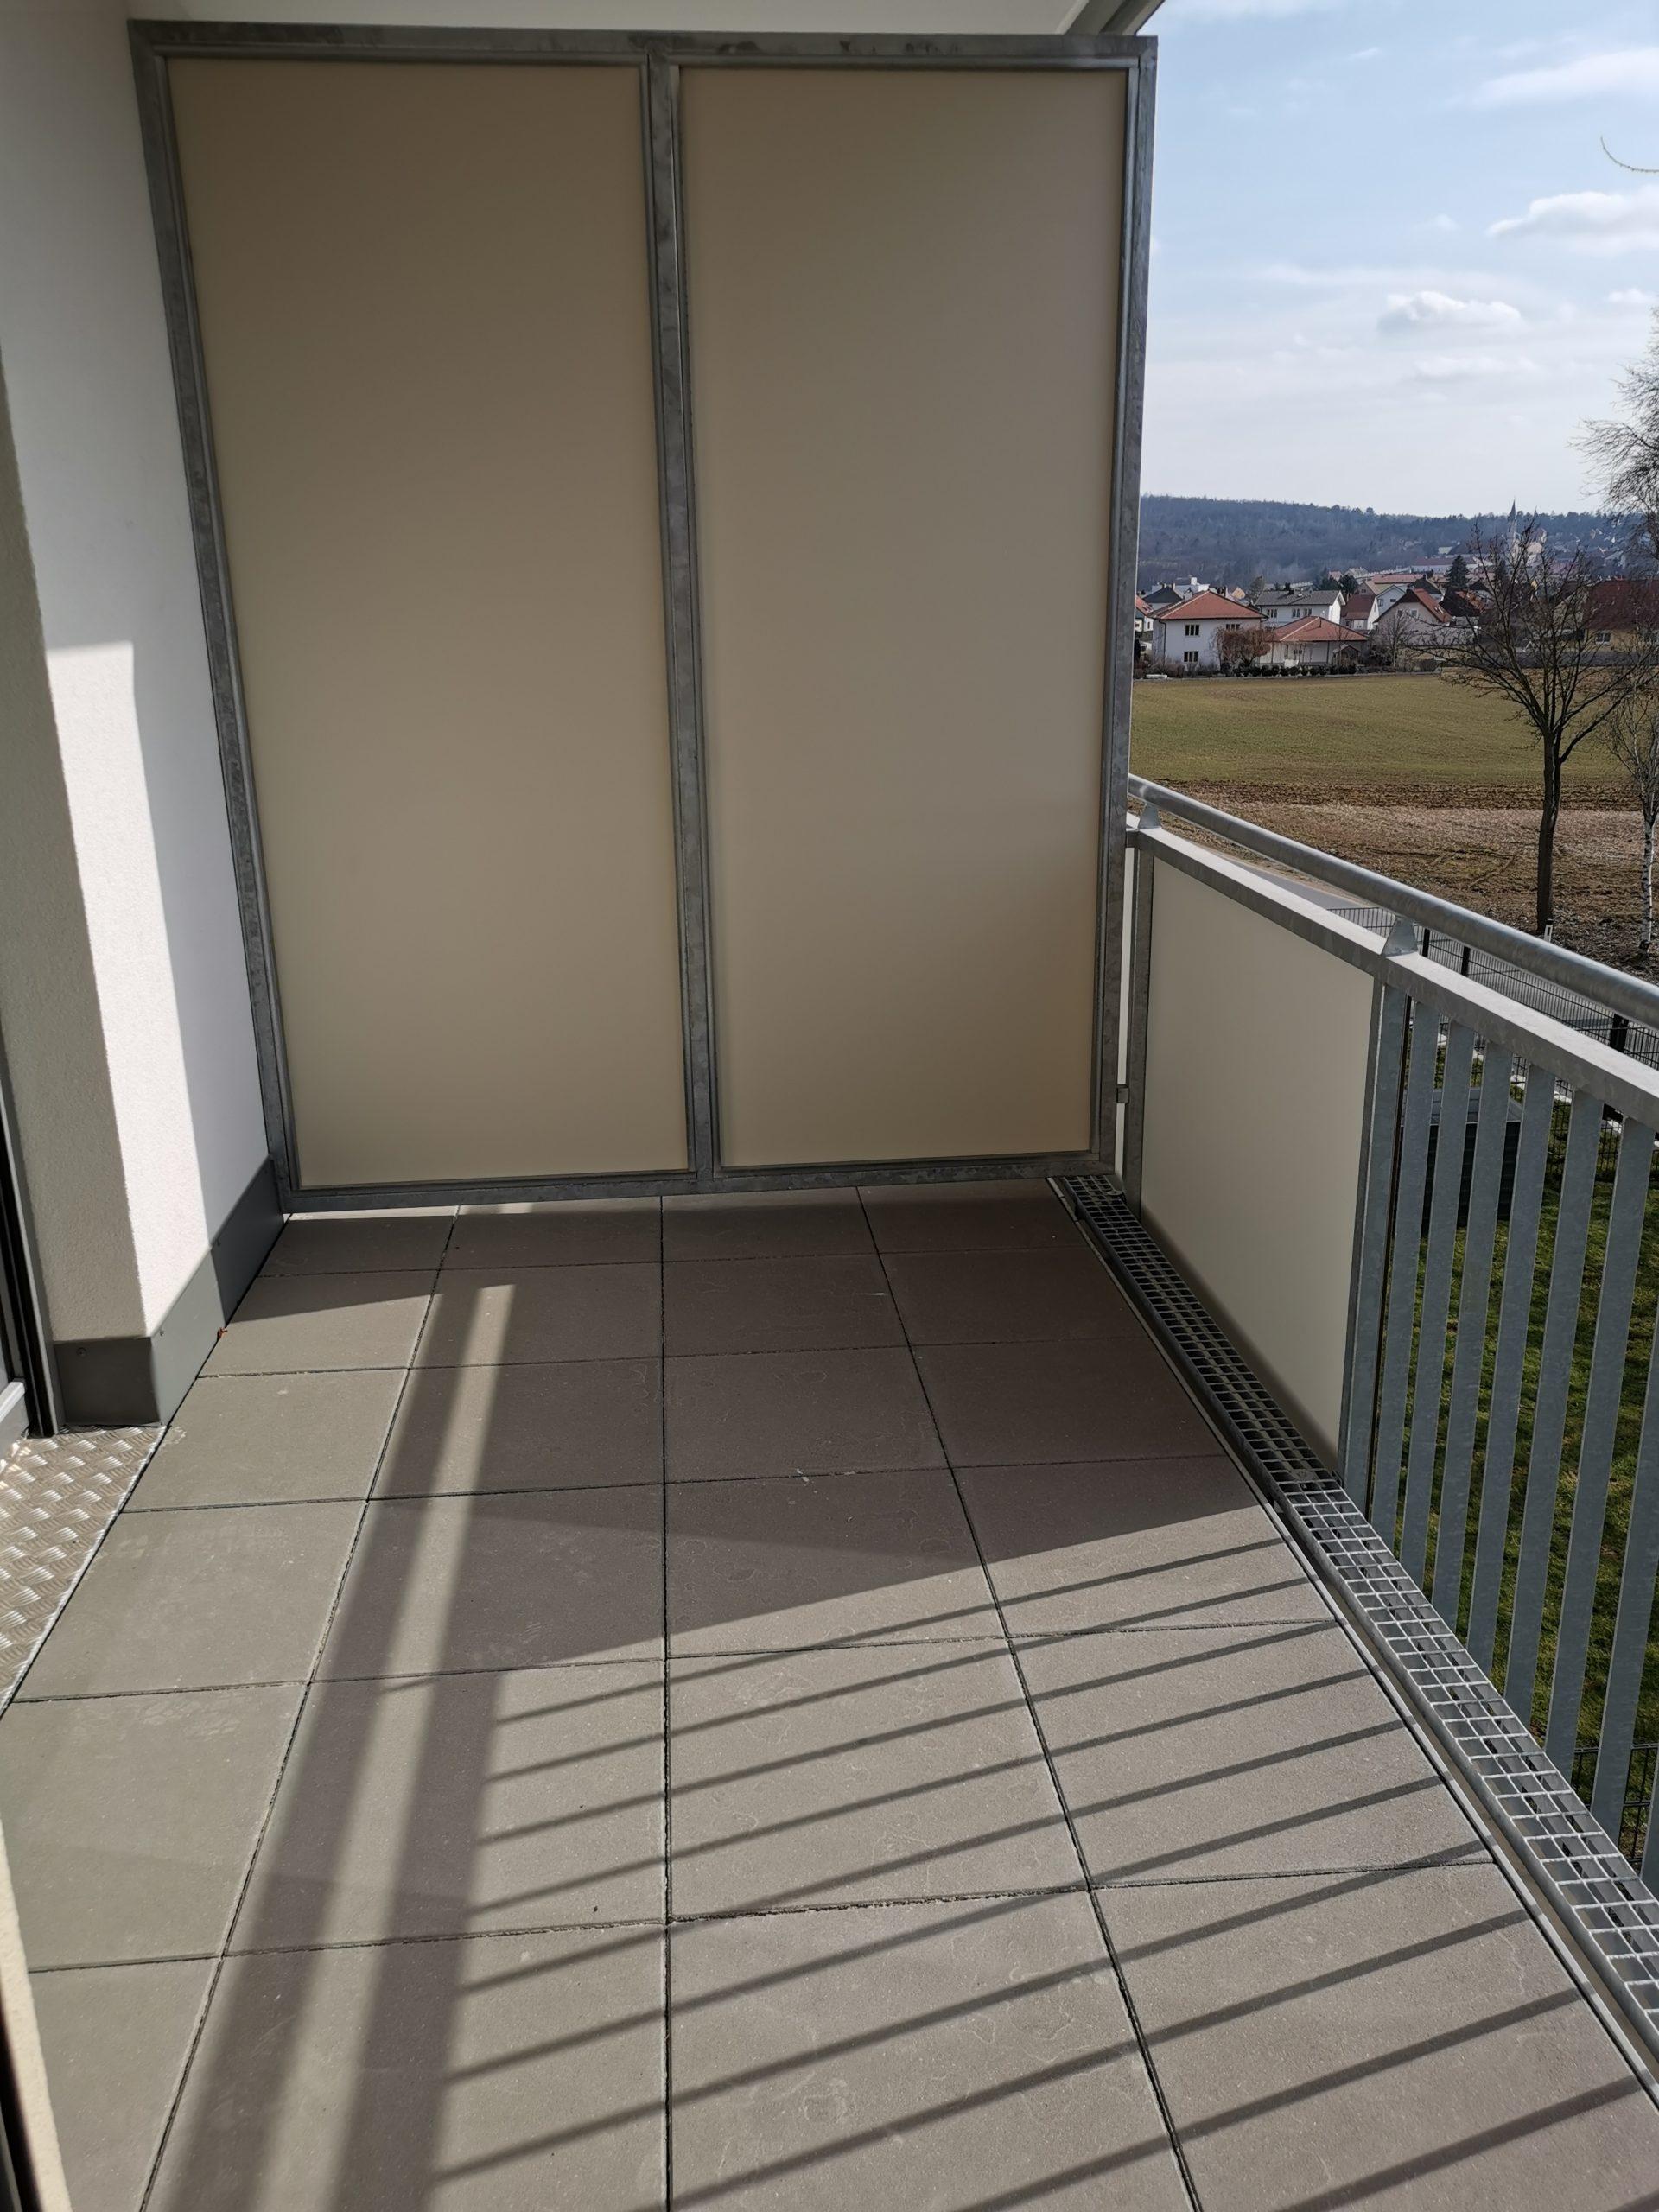 Immobilie von Kamptal in 3730 Eggenburg, Horn, Eggenburg VII - Top 107 #3